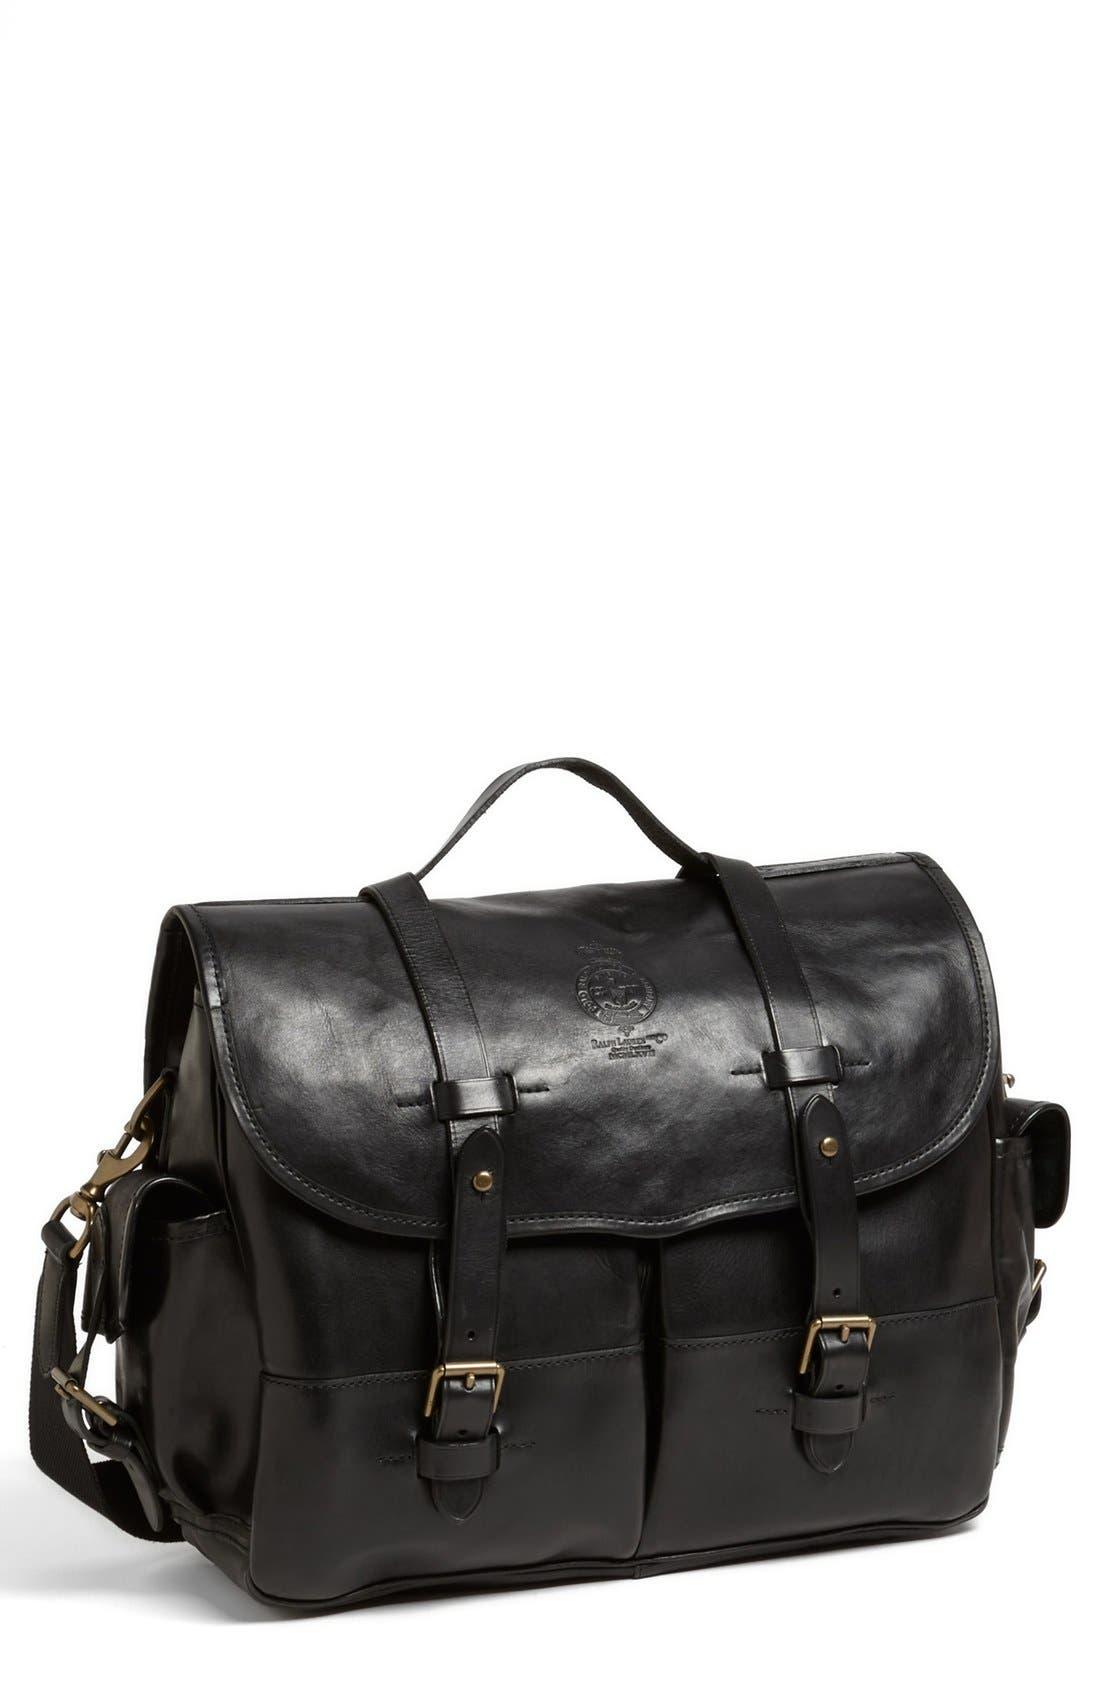 POLO RALPH LAUREN Leather Briefcase, Main, color, 001